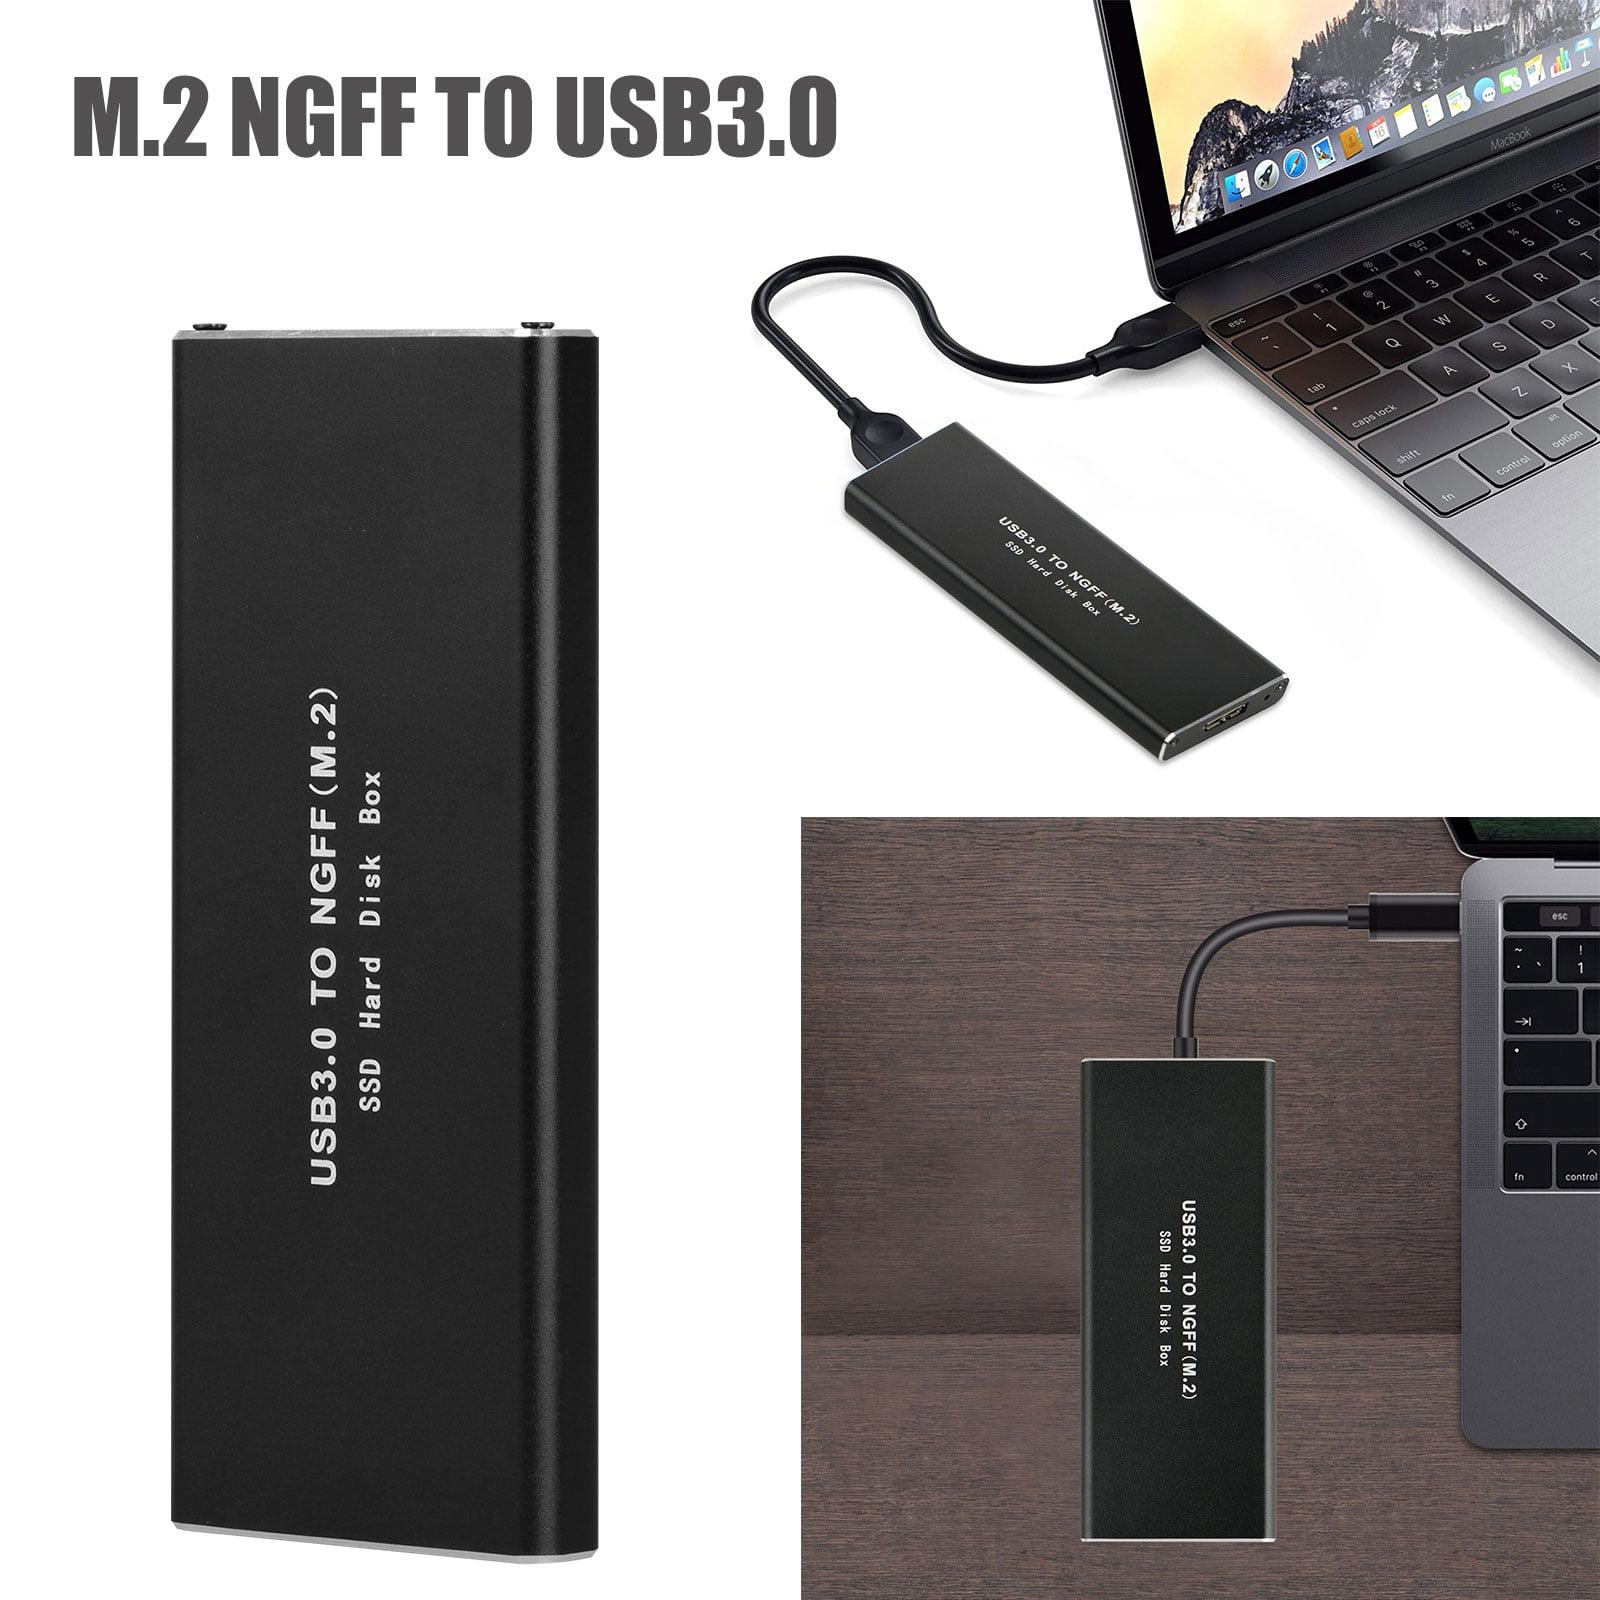 M.2 SATA SSD to USB 3.0 External SSD Reader Converter Adapter Enclosure Aluminum